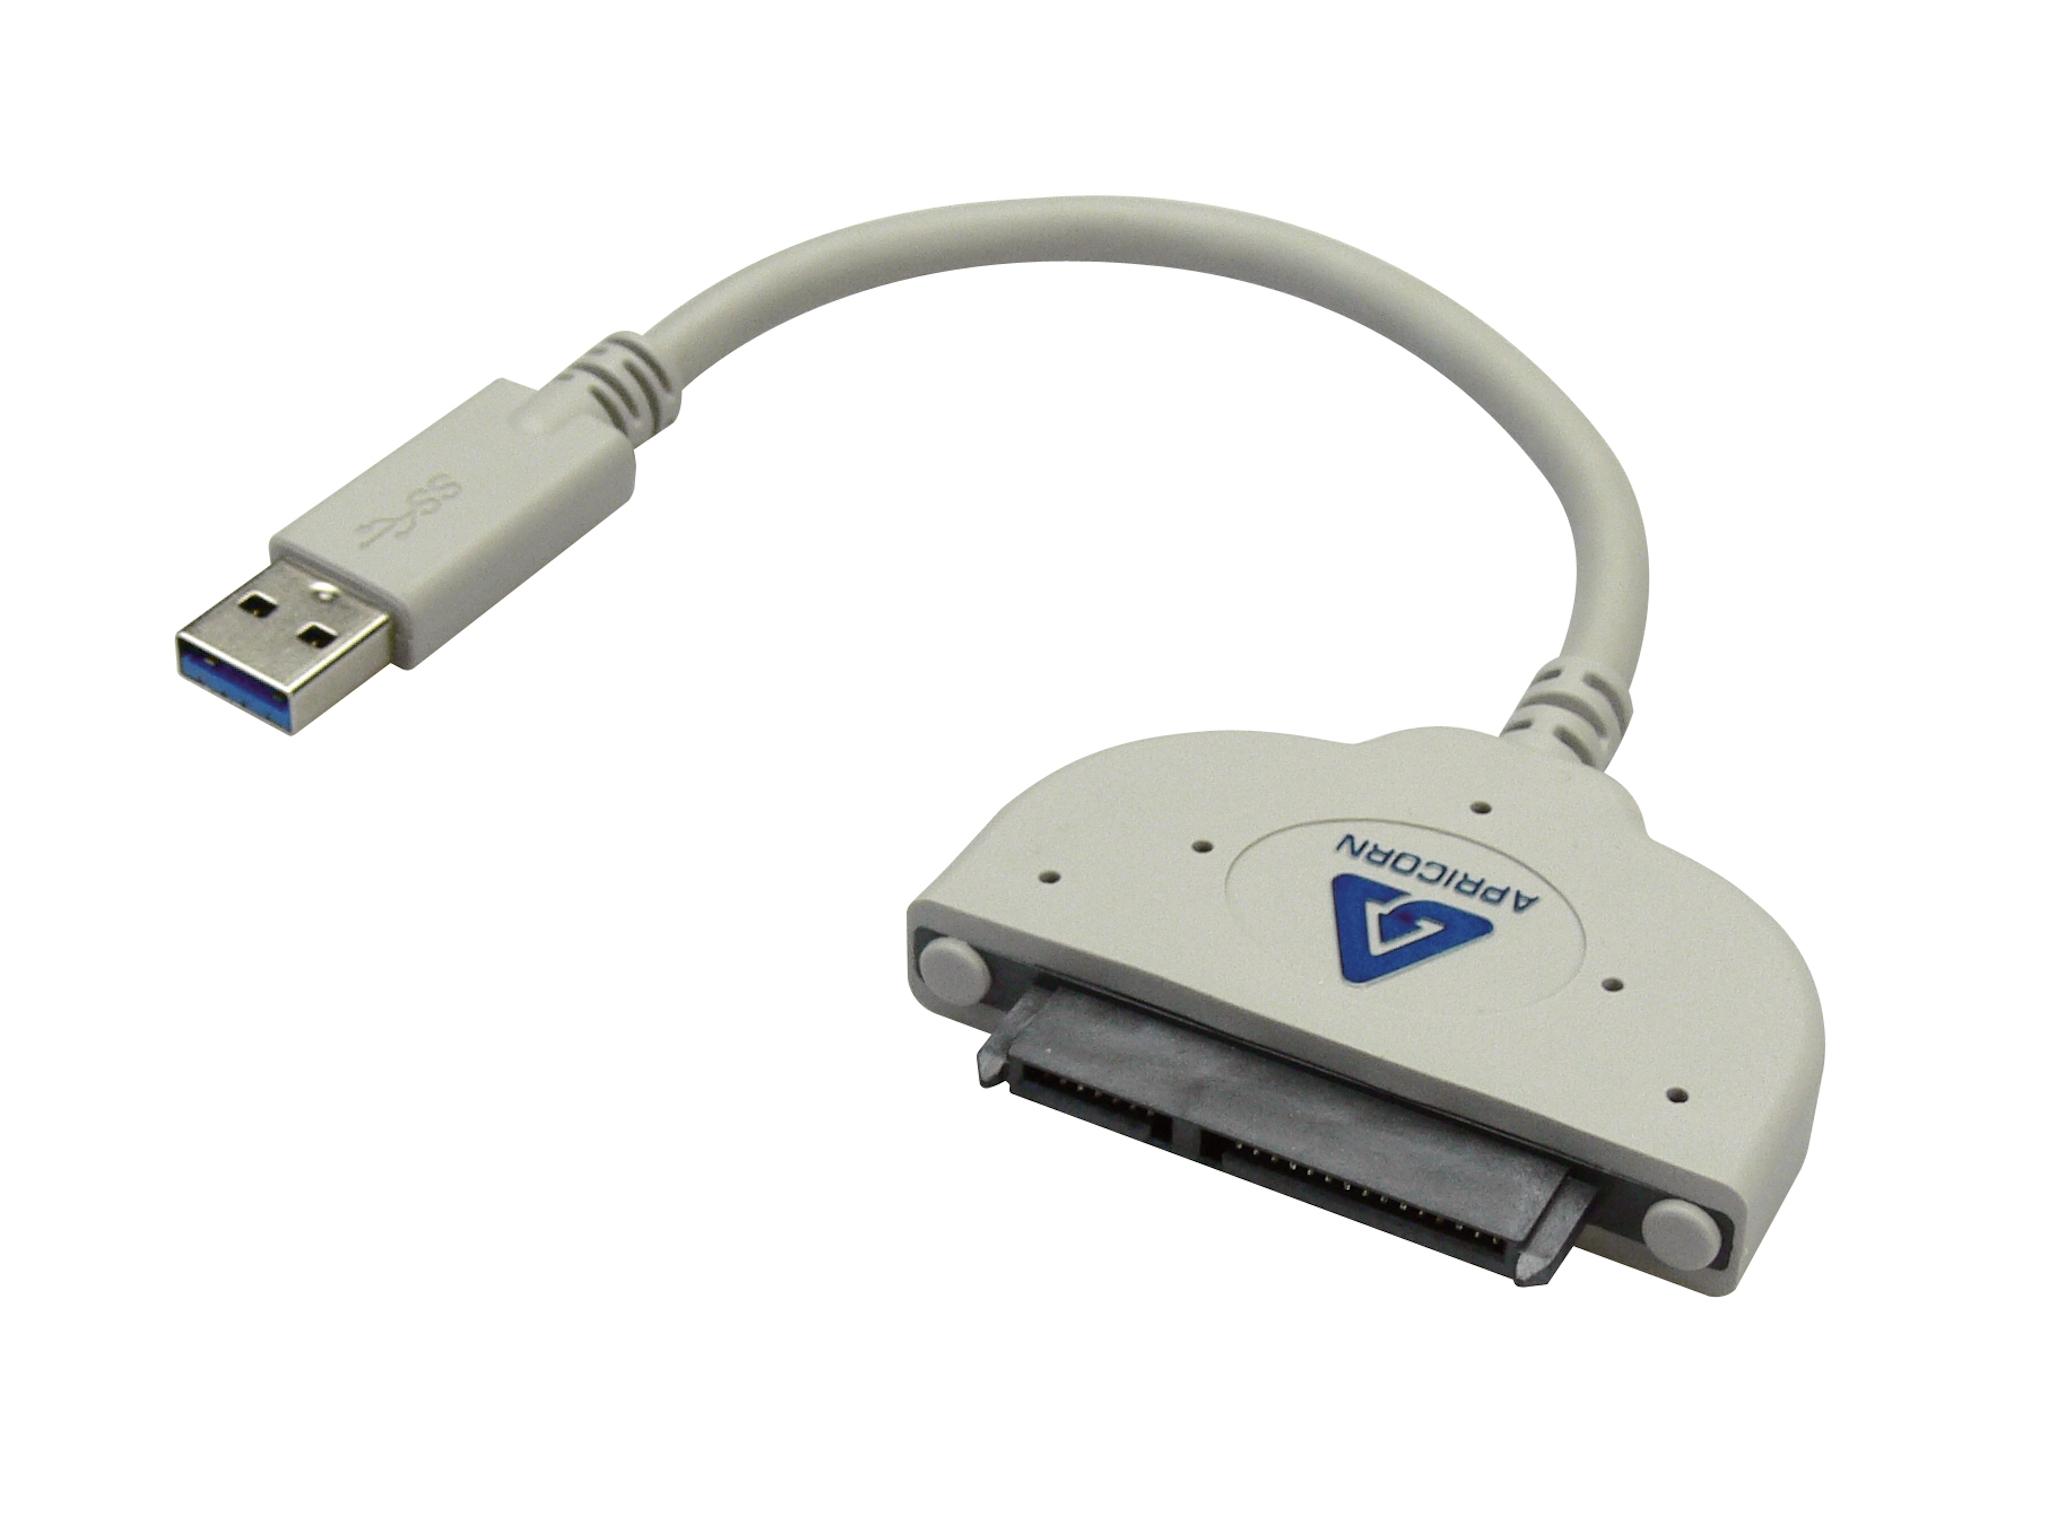 SANDBERG A/S Sandberg USB 3.0 Hard Disk Clone Cable